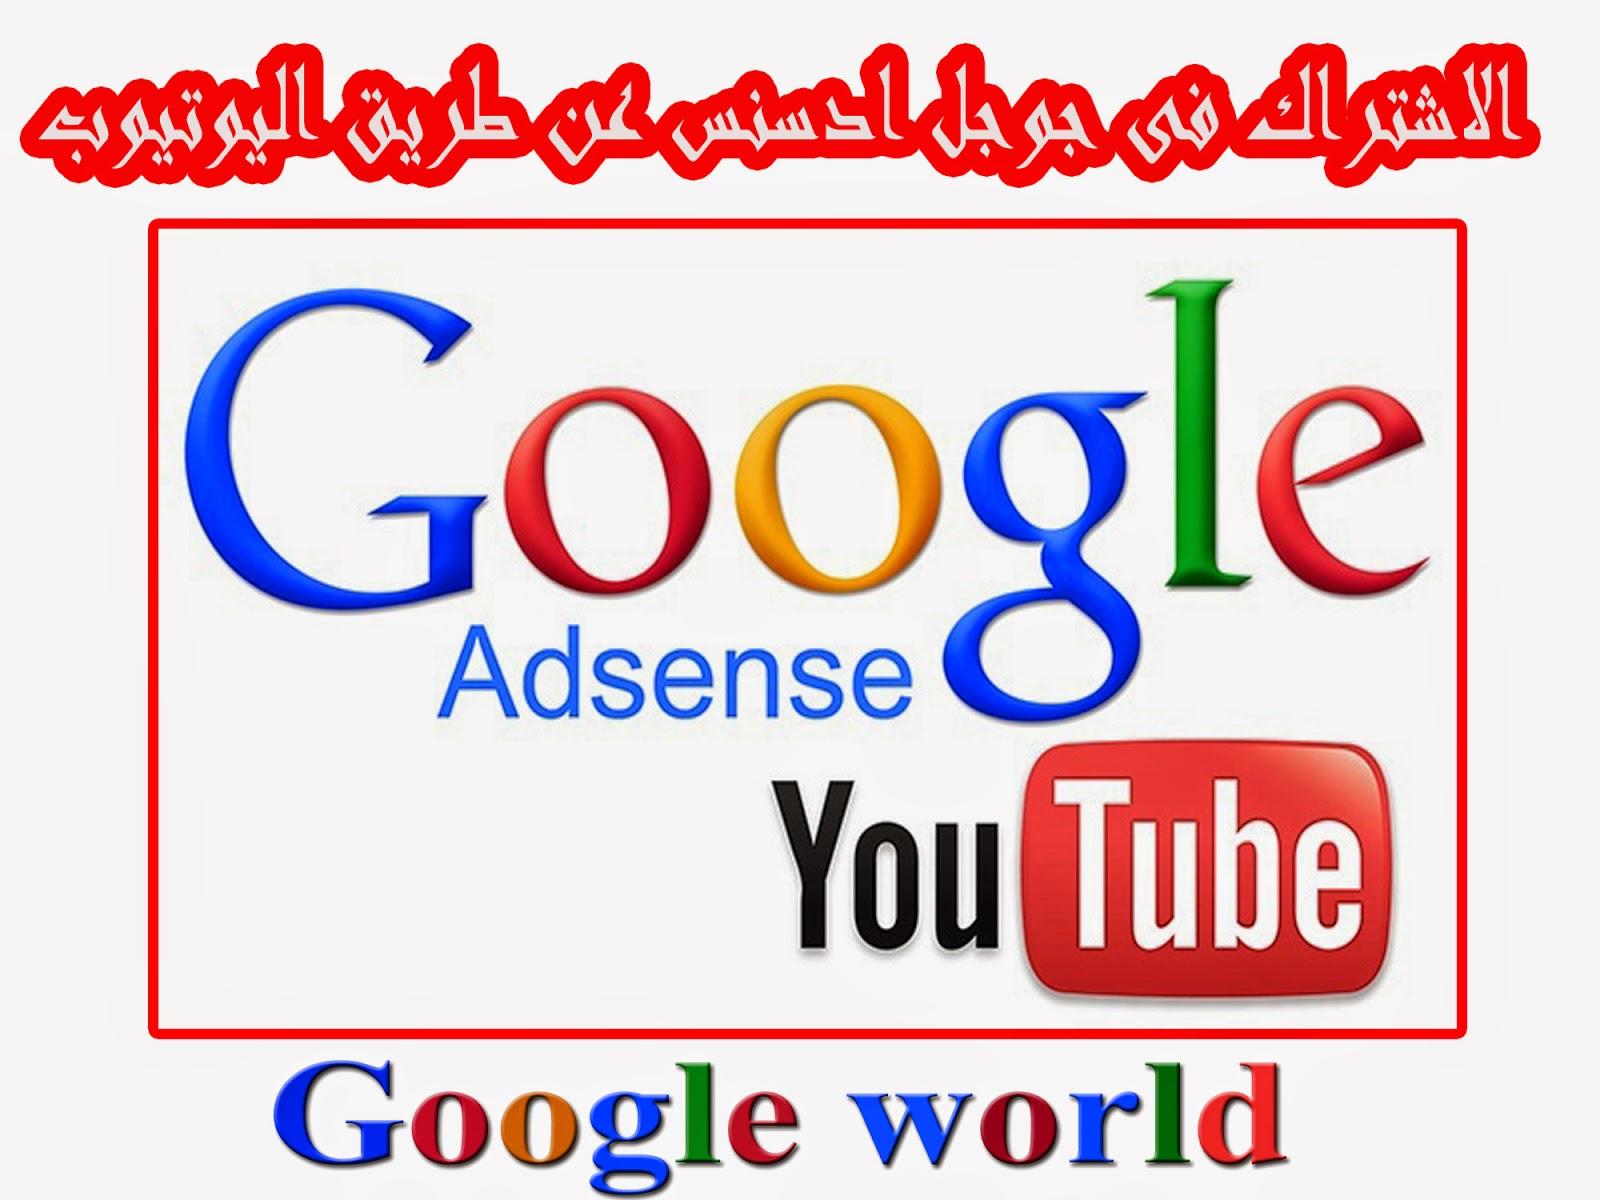 eaf77f96f الاشتراك فى جوجل ادسنس عن طريق اليوتيوب Adsense From Youtube ~ عالم جوجل